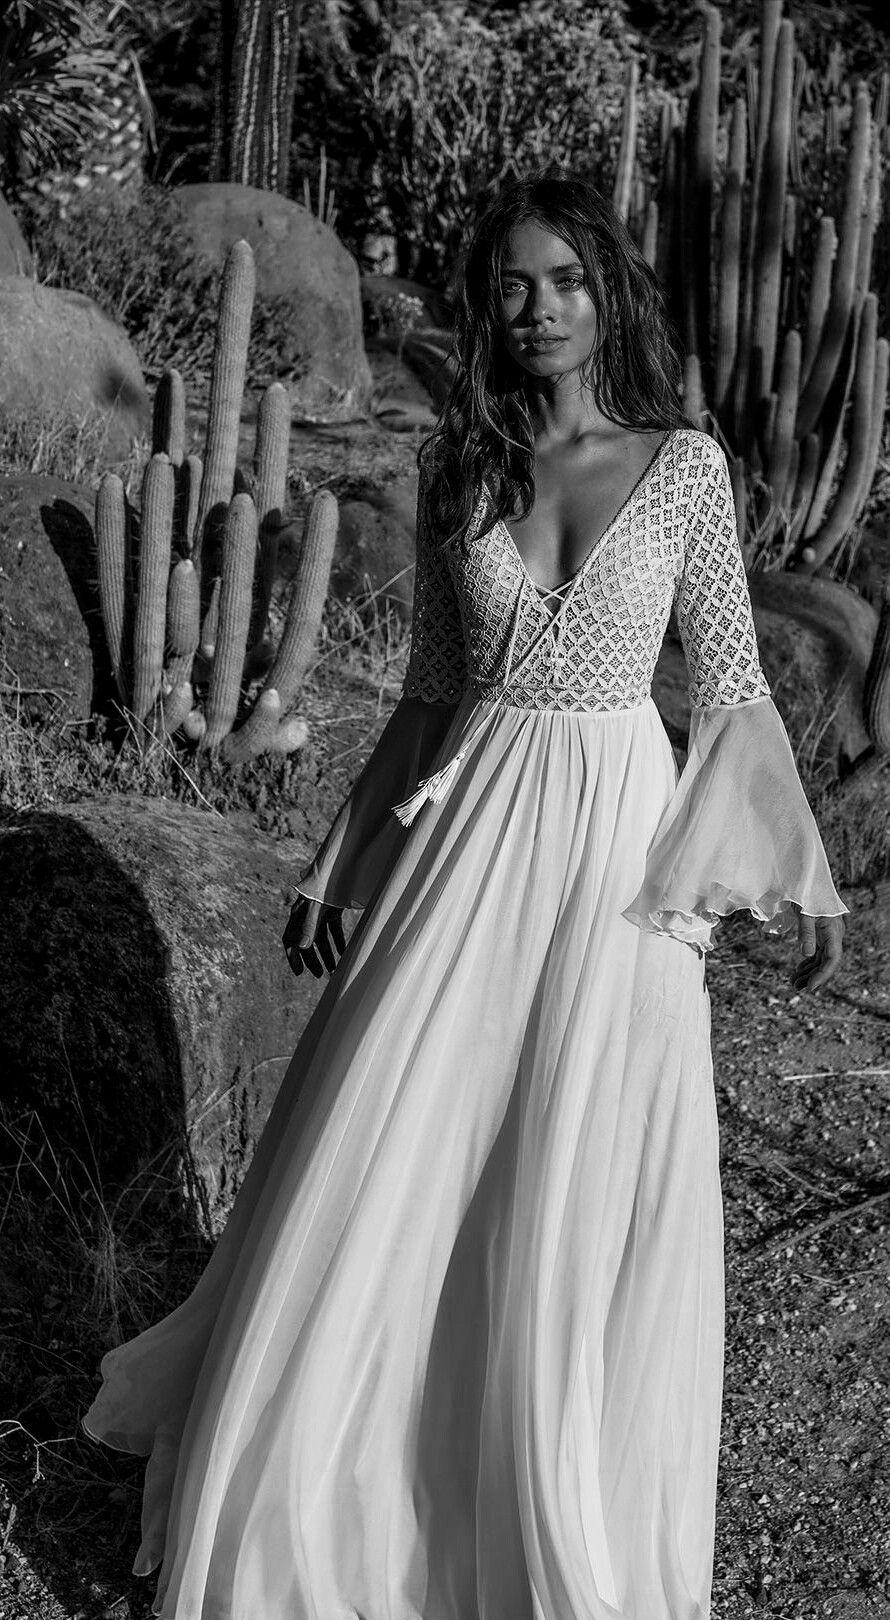 Pin by nágila ferreira on mix pinterest wedding dress boho and